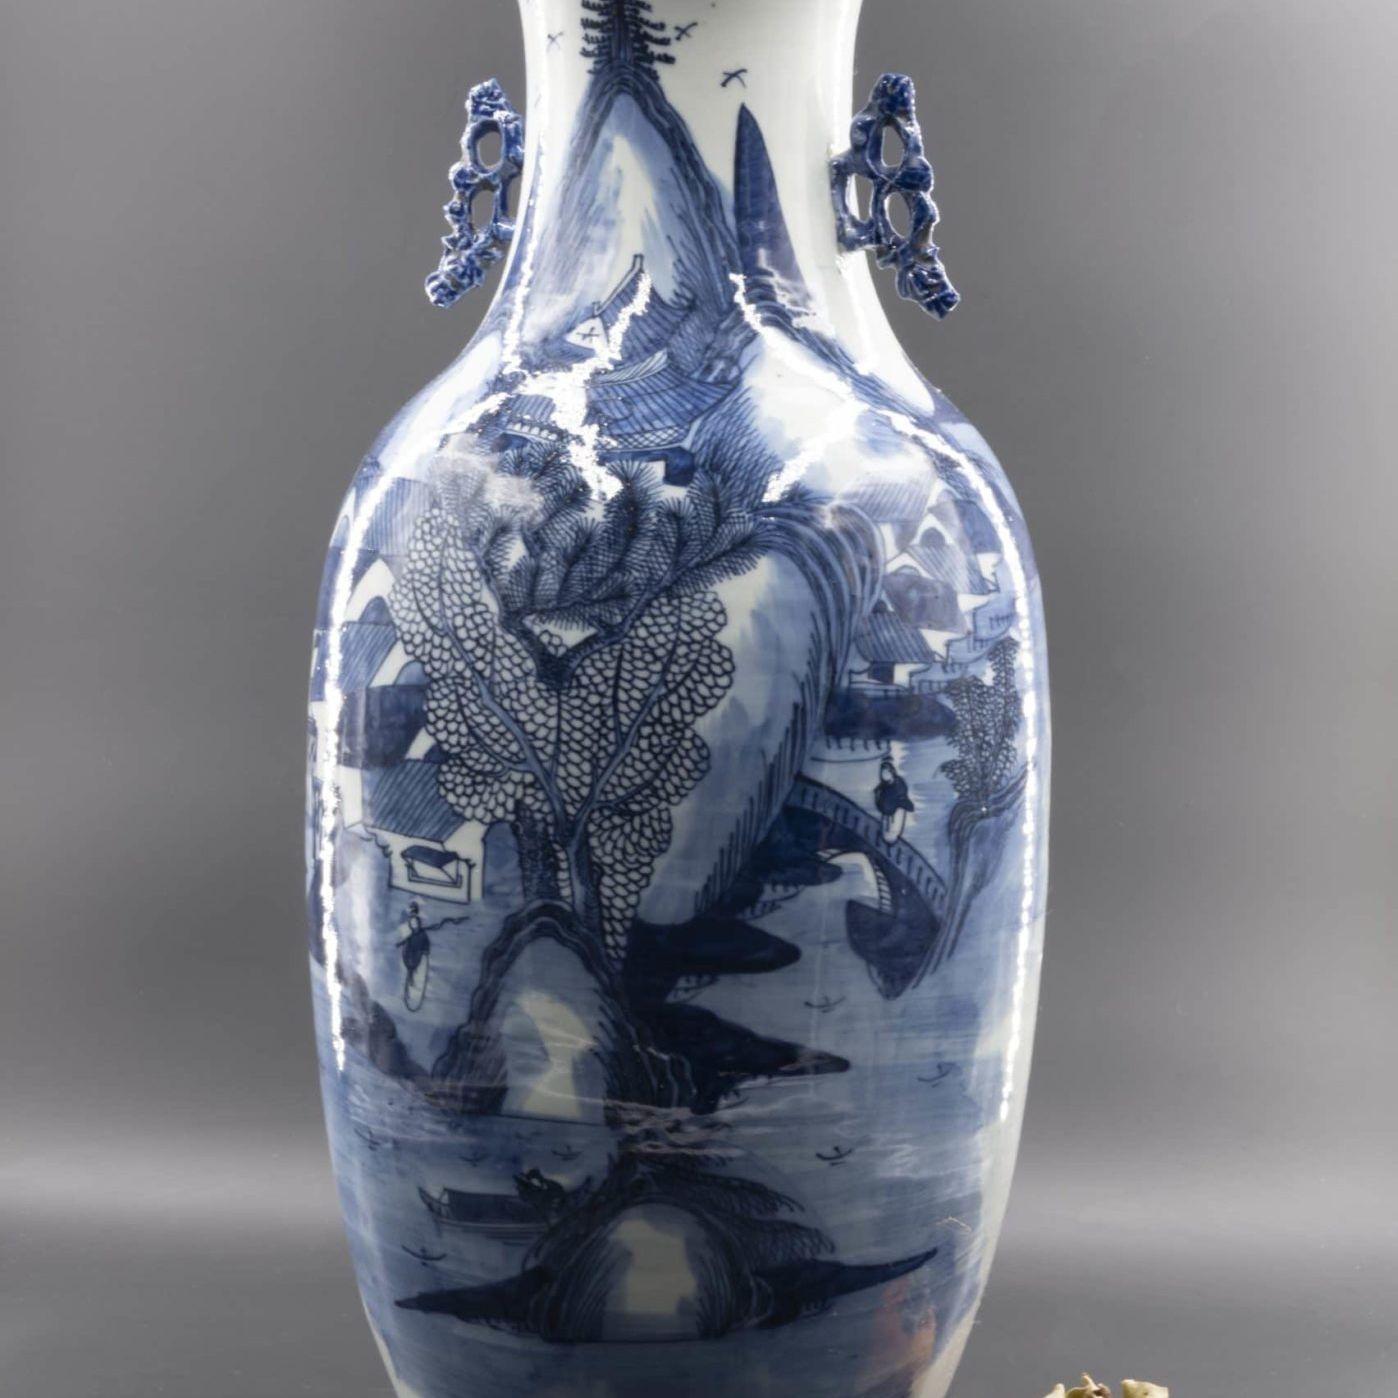 Vase chinois shanshui bleu et blanc, XIXe siècle.